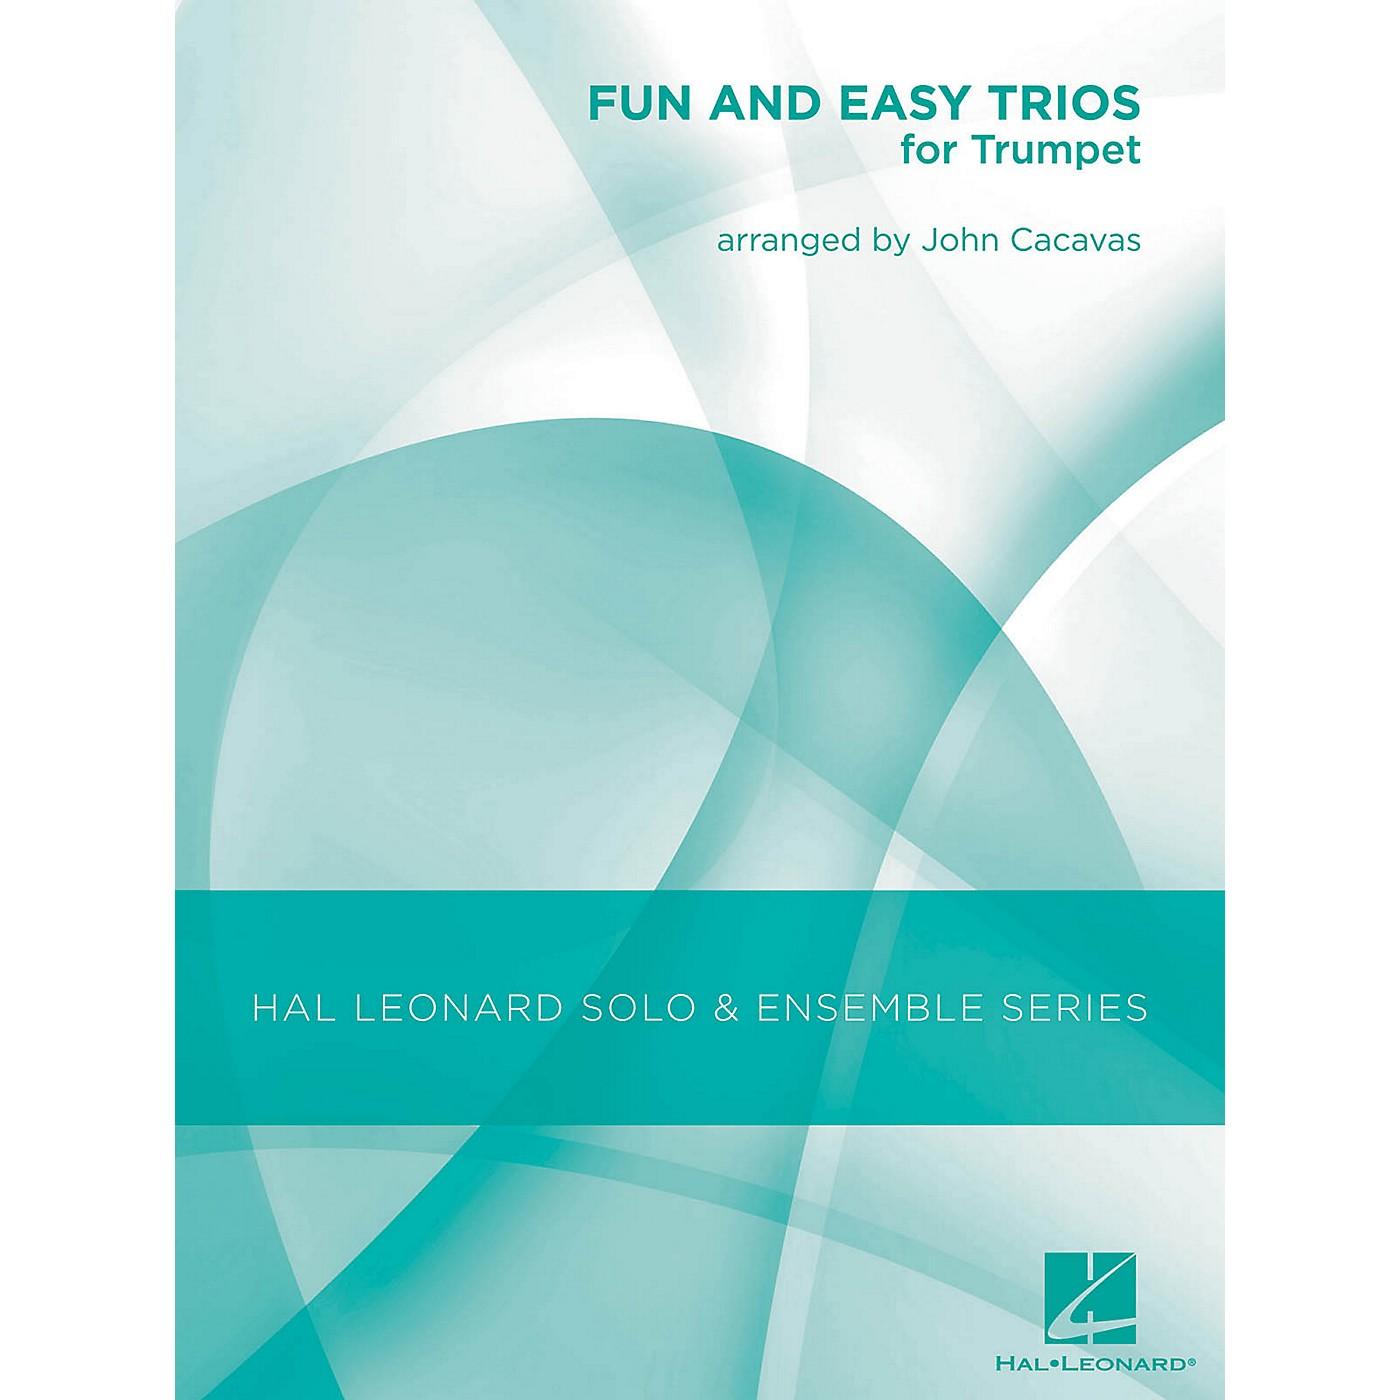 Hal Leonard Fun & Easy Trios for Trumpet - Hal Leonard Solo & Ensemble Series Arranged By John Cacavas thumbnail